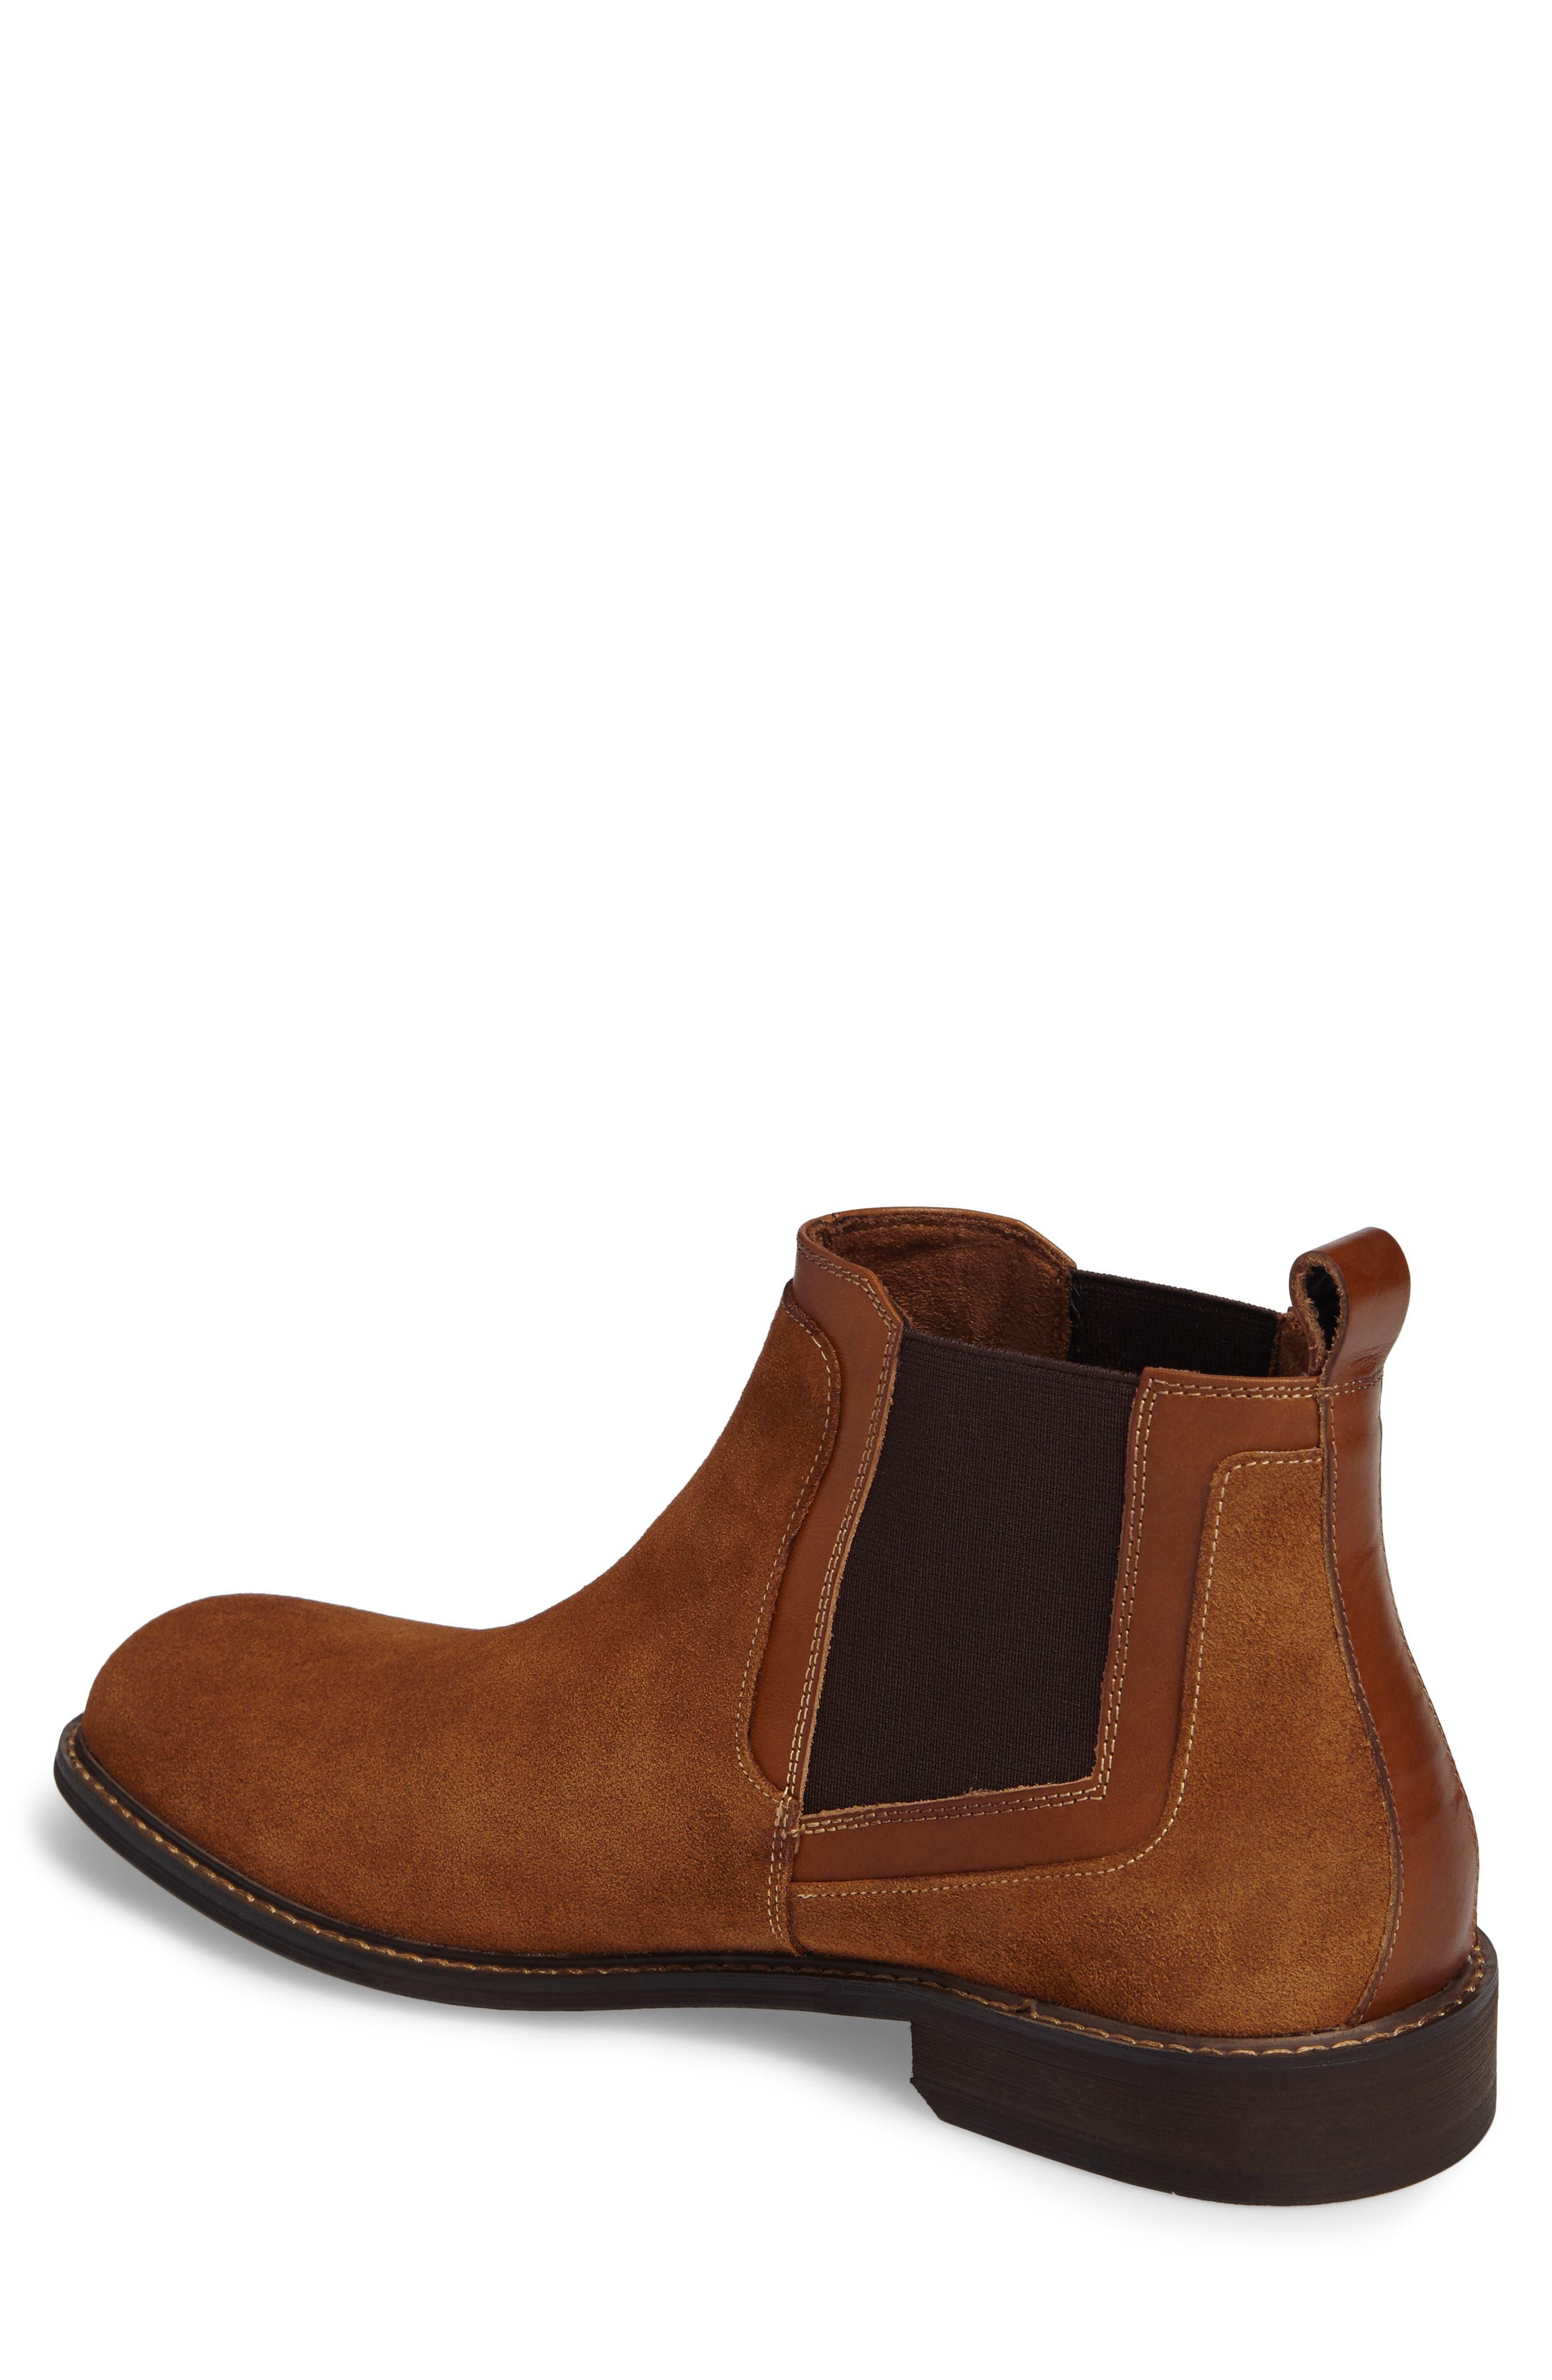 Alternate Image 2  - Kenneth Cole New York Chlesea Boot (Men)